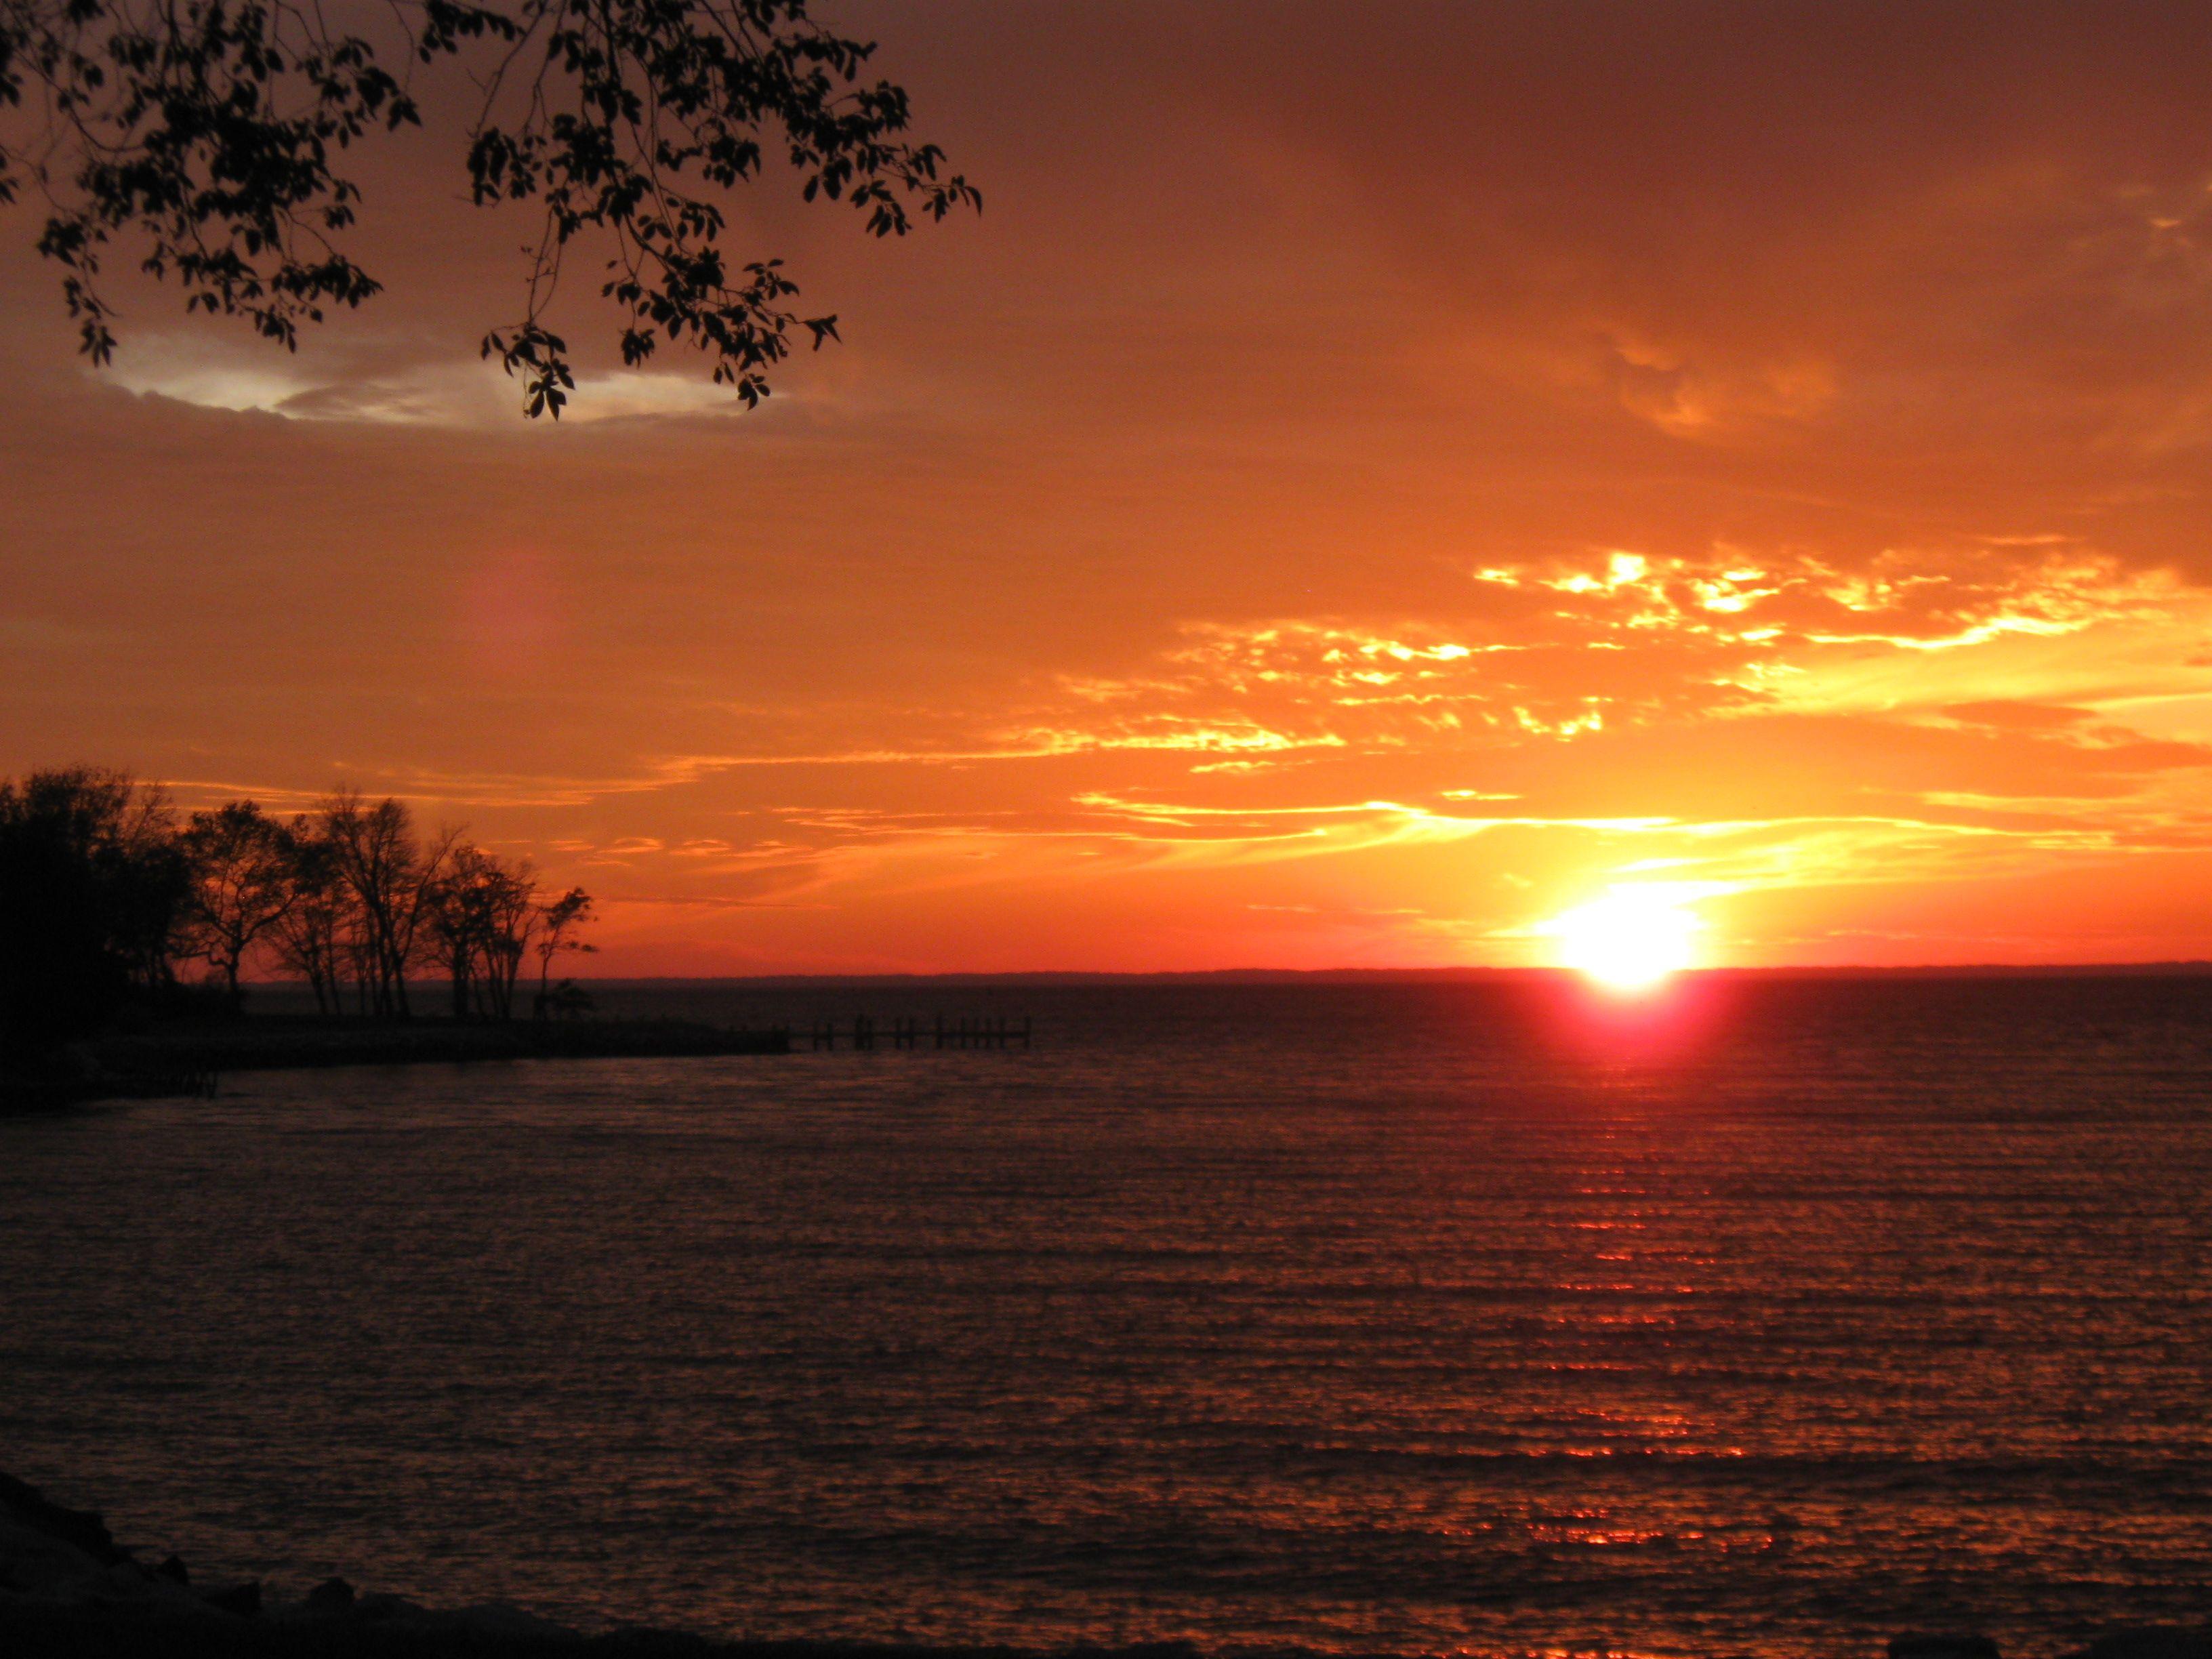 Sunset Sunset Landscape Chesapeake